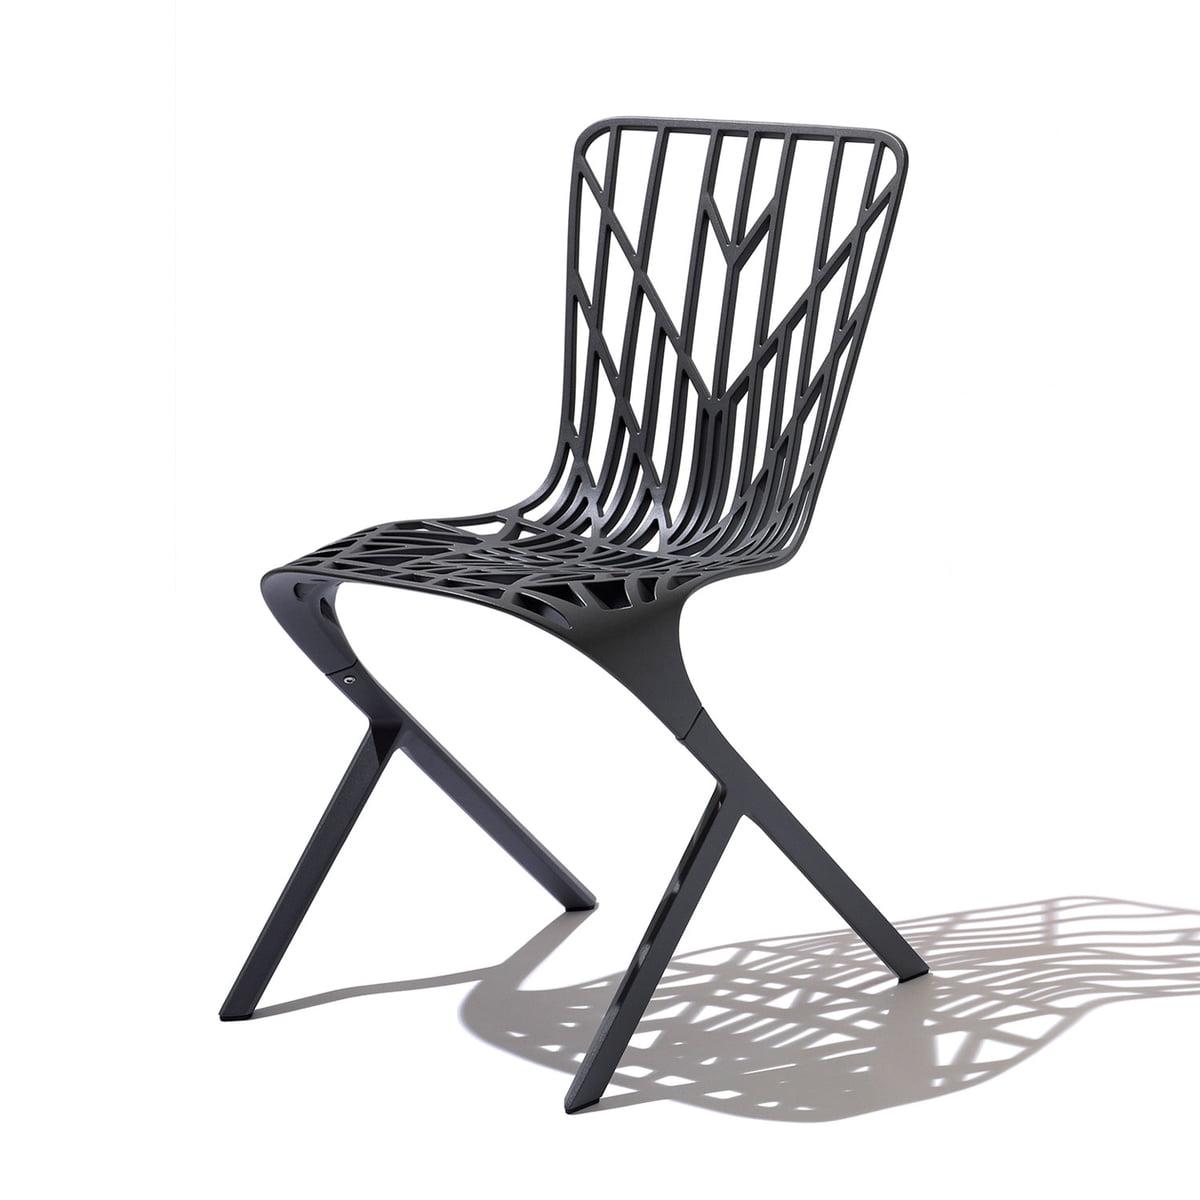 washington skeleton chair von knoll connox. Black Bedroom Furniture Sets. Home Design Ideas